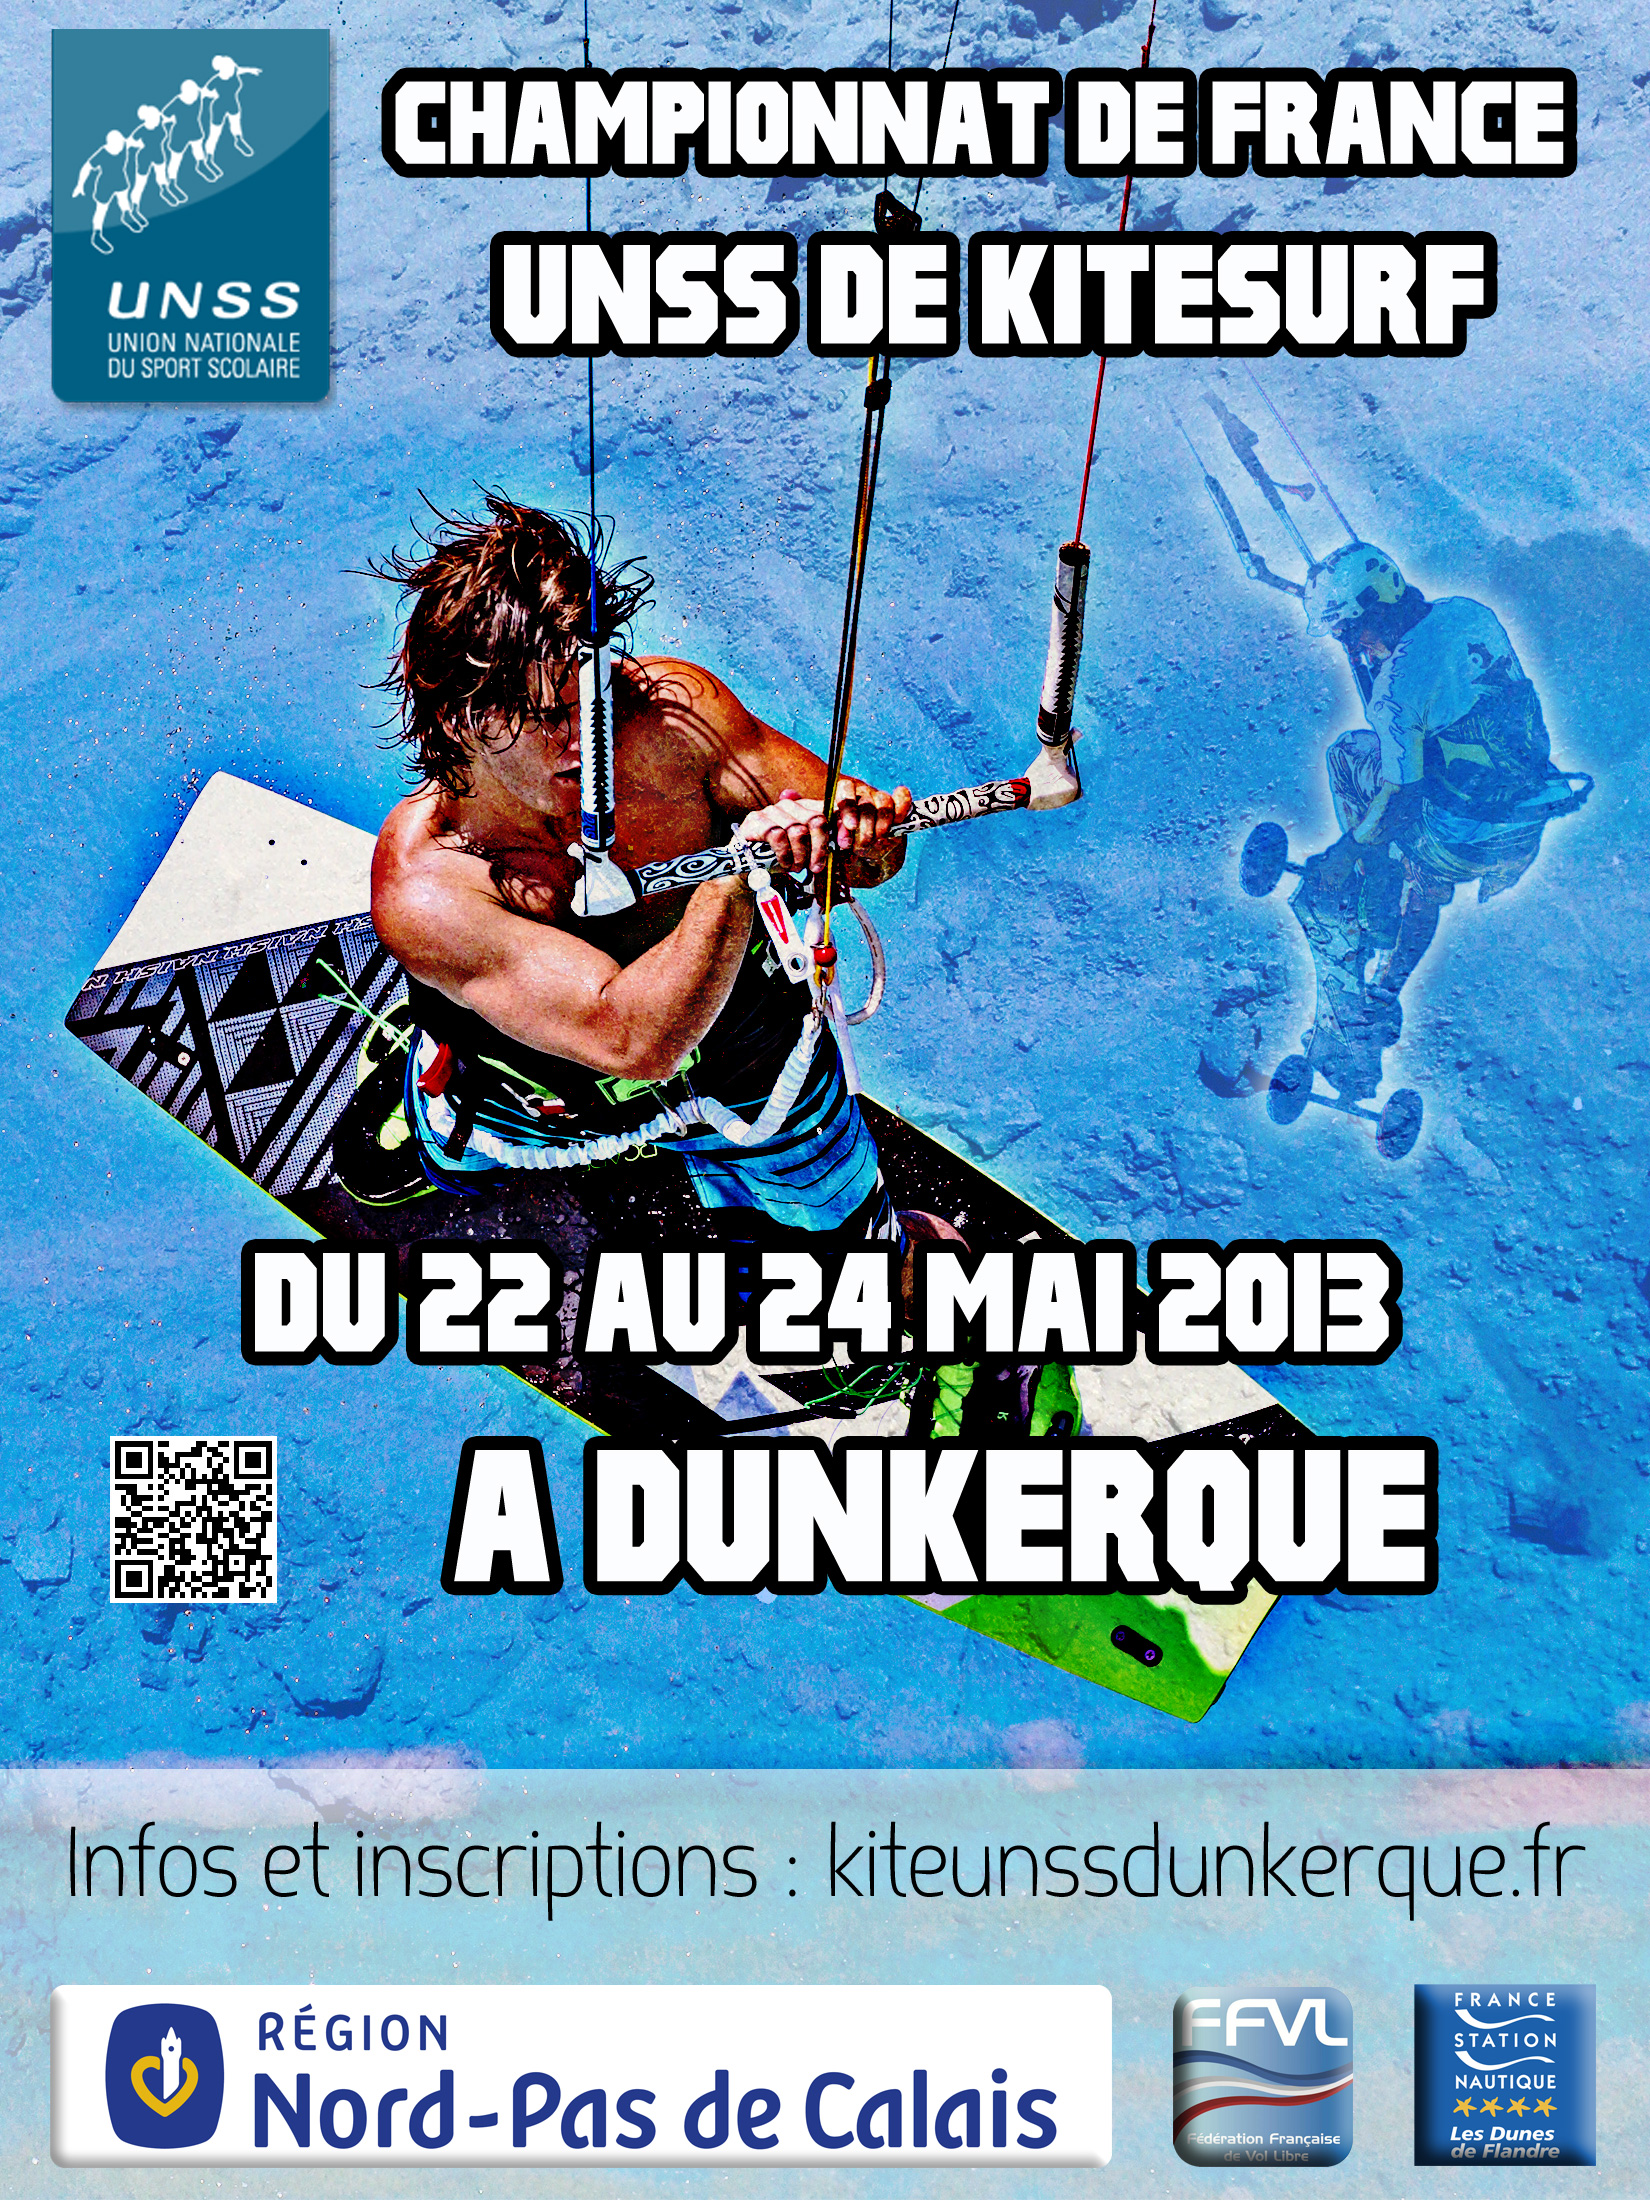 Affiche CF UNSS 2013